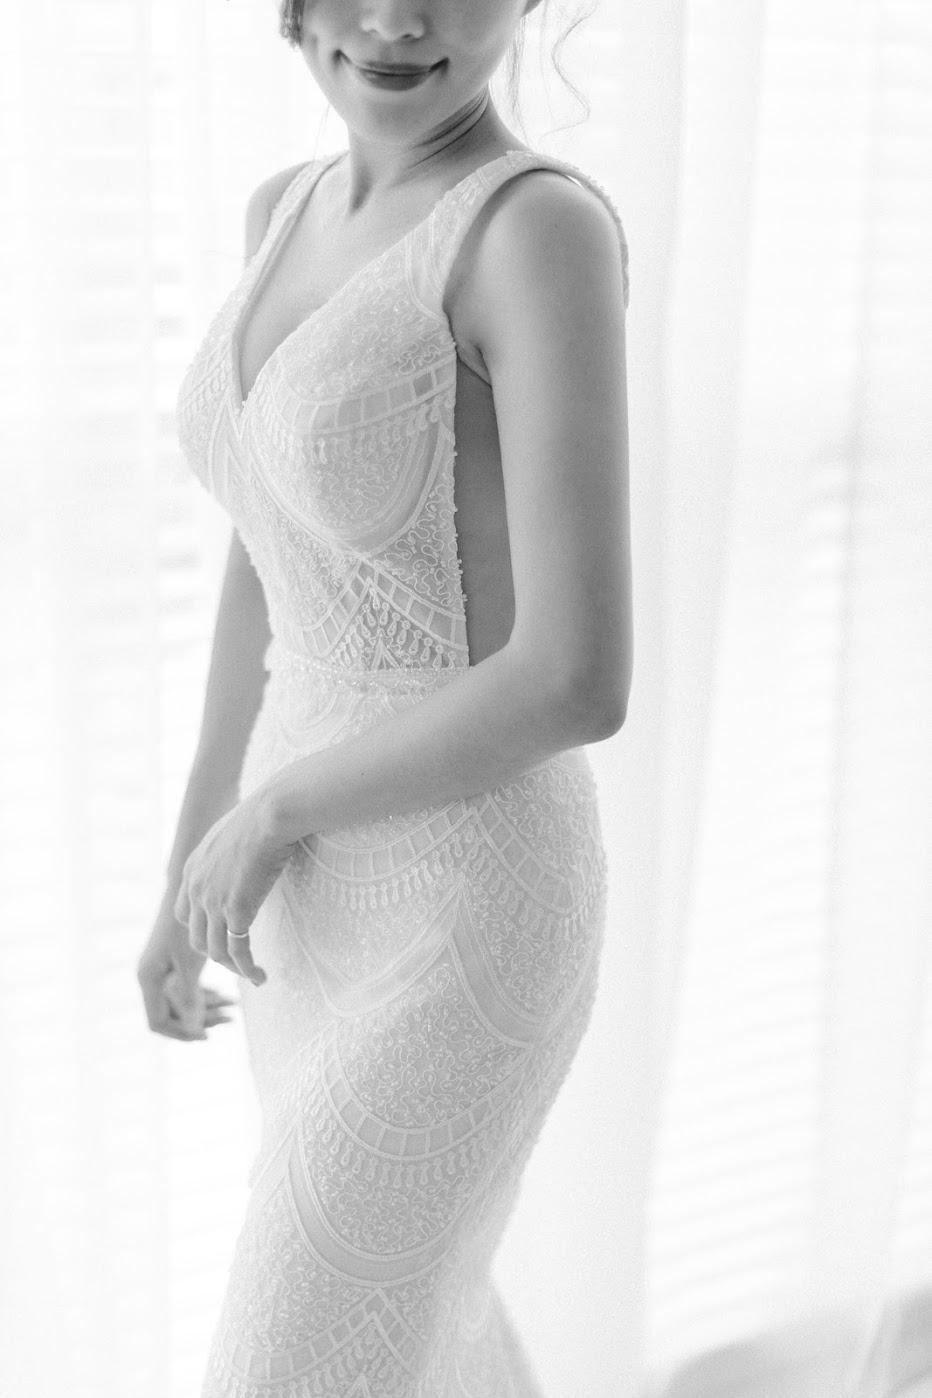 Amazing grace Studio,自助婚紗,美式婚紗,台中婚紗,engagement,fine art,wedding photography,男孩看見野玫瑰 花藝